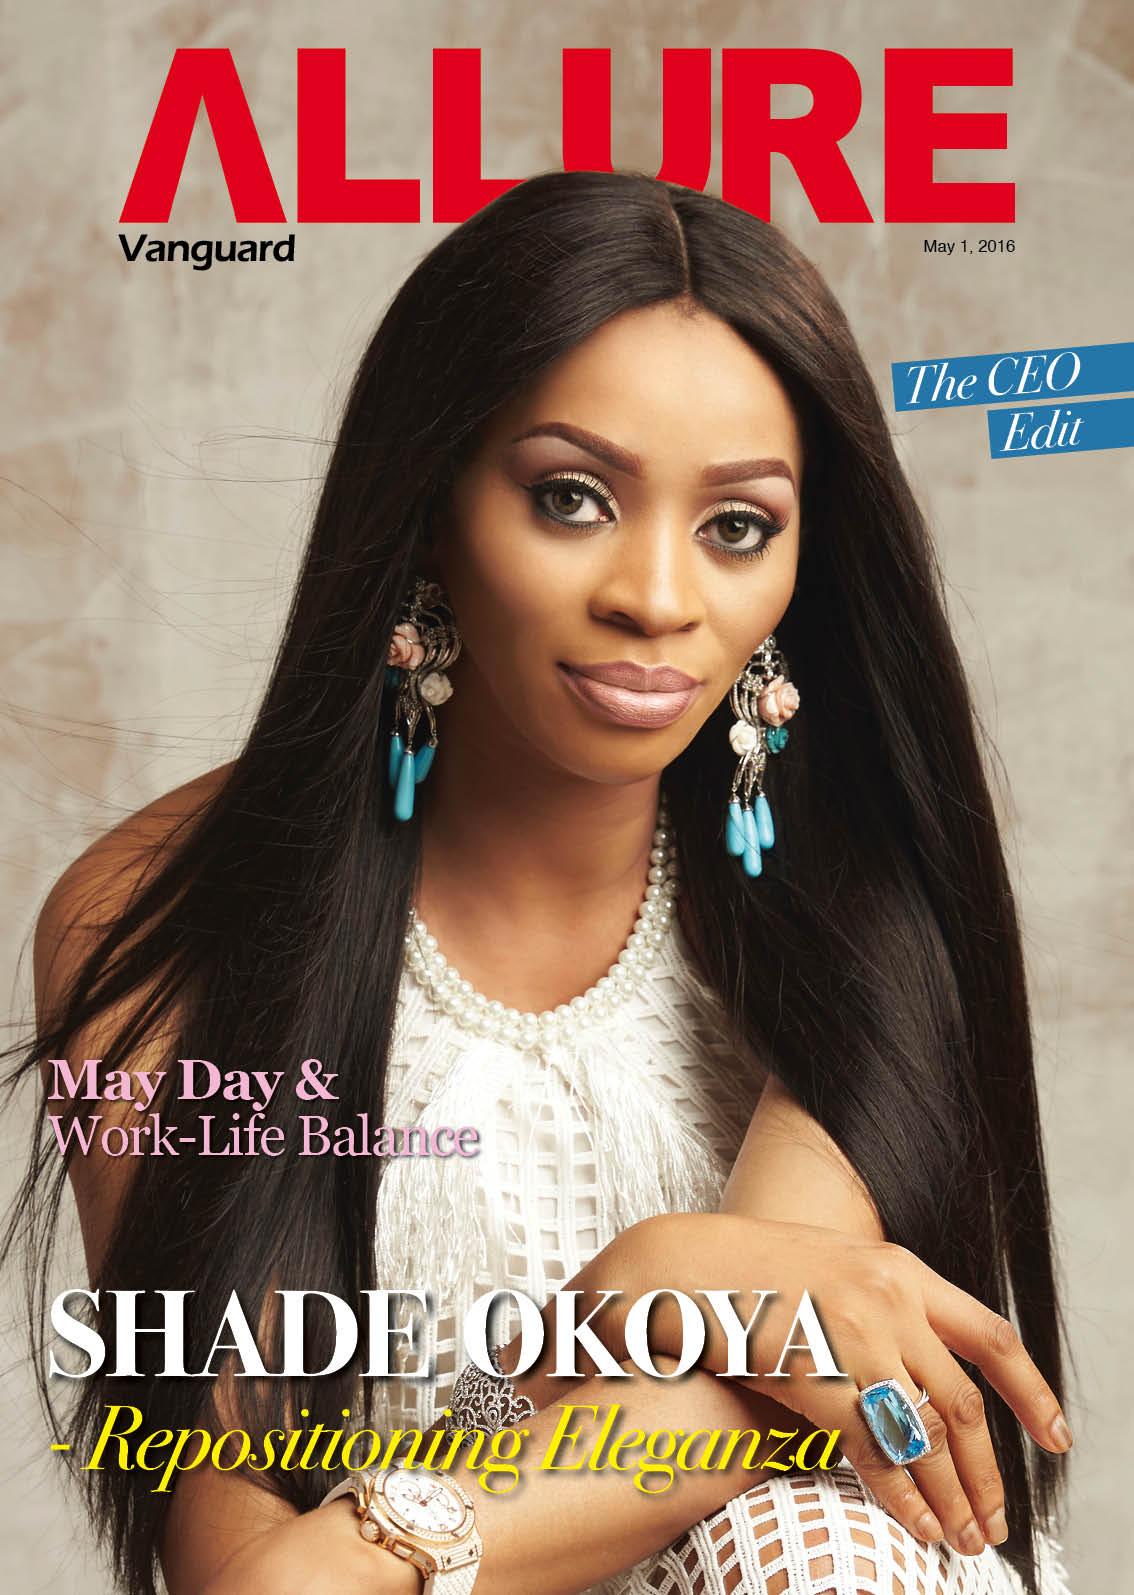 Shade Okoya Vanguard Allure 2016